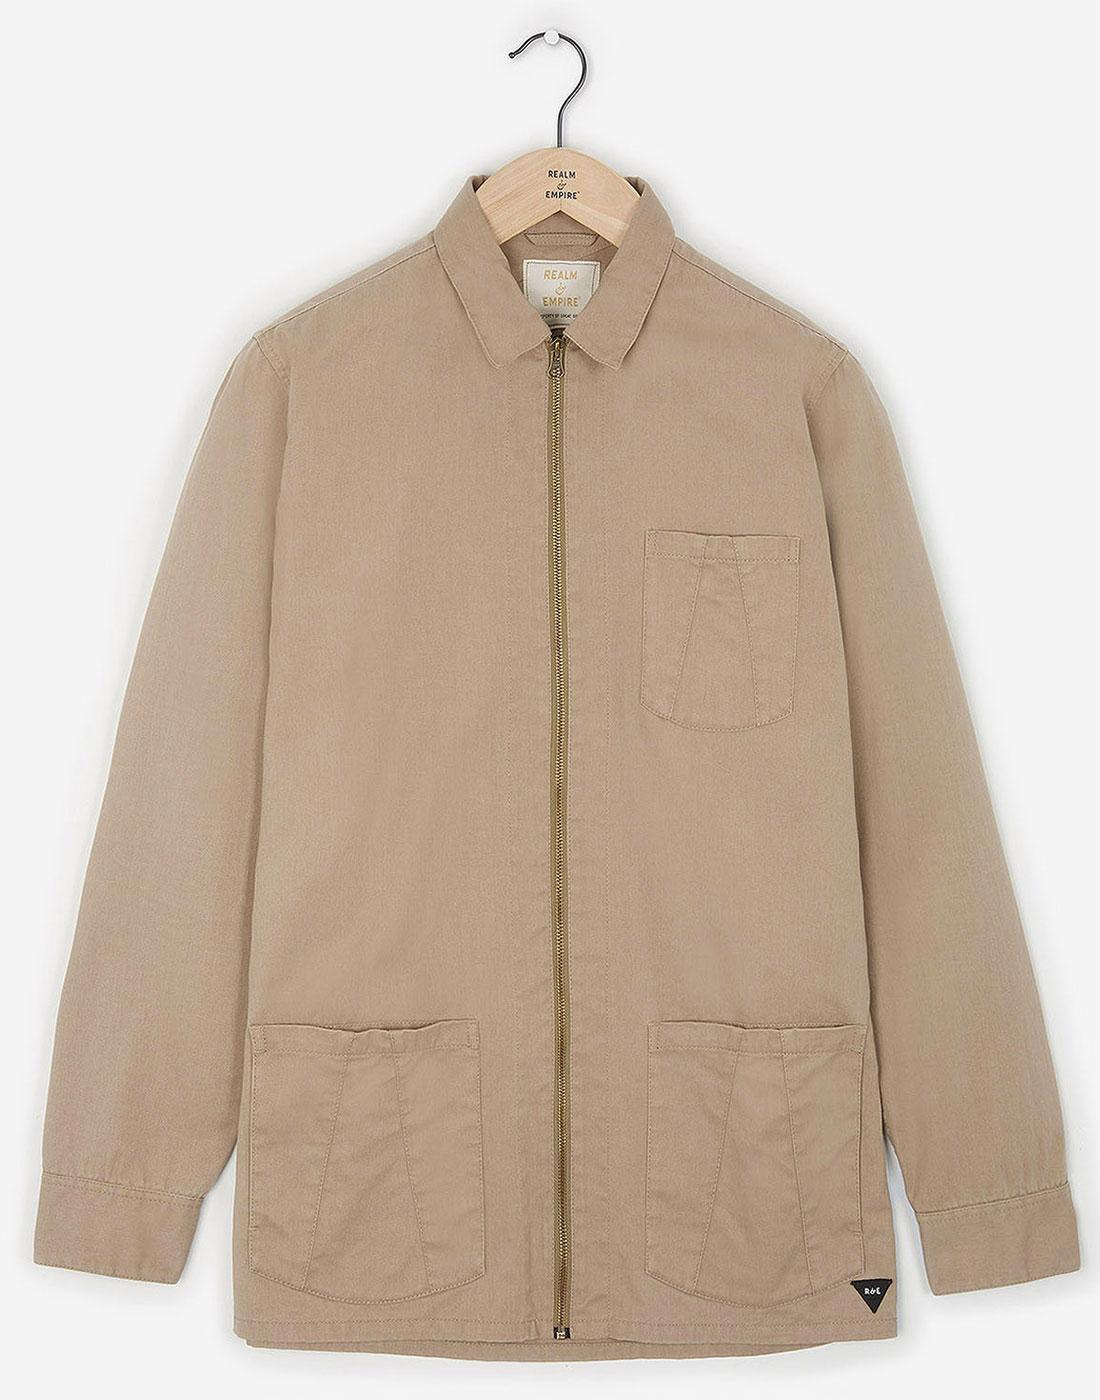 REALM & EMPIRE Zip Thru Military Workwear Jacket